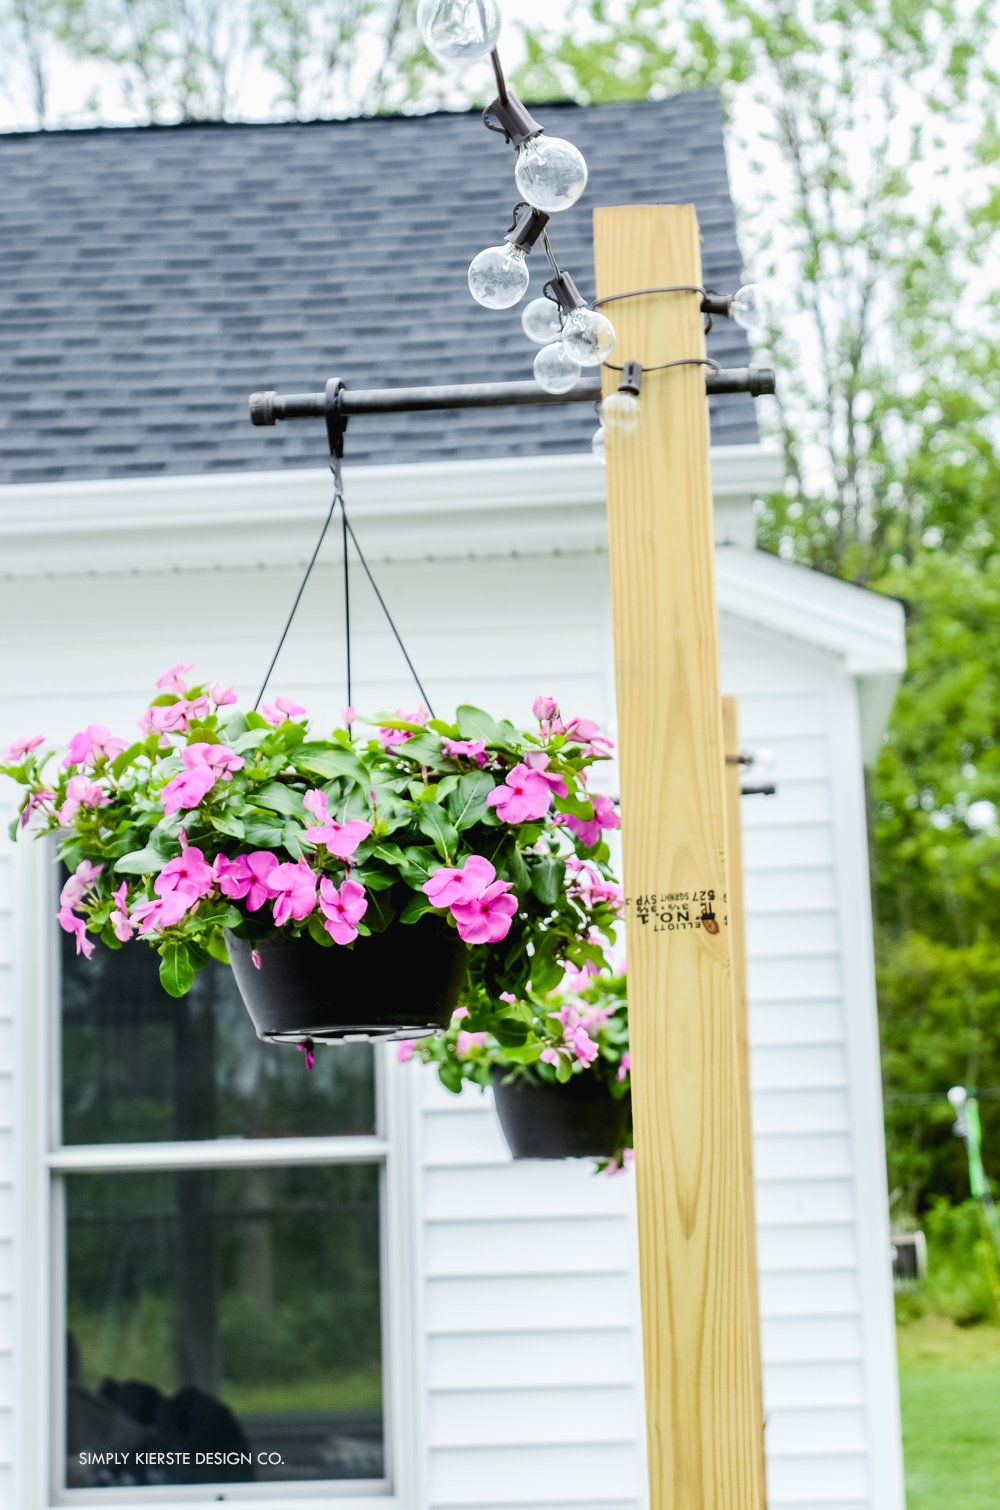 Outdoor String Lights on DIY Posts - Simply Kierste Design Co.